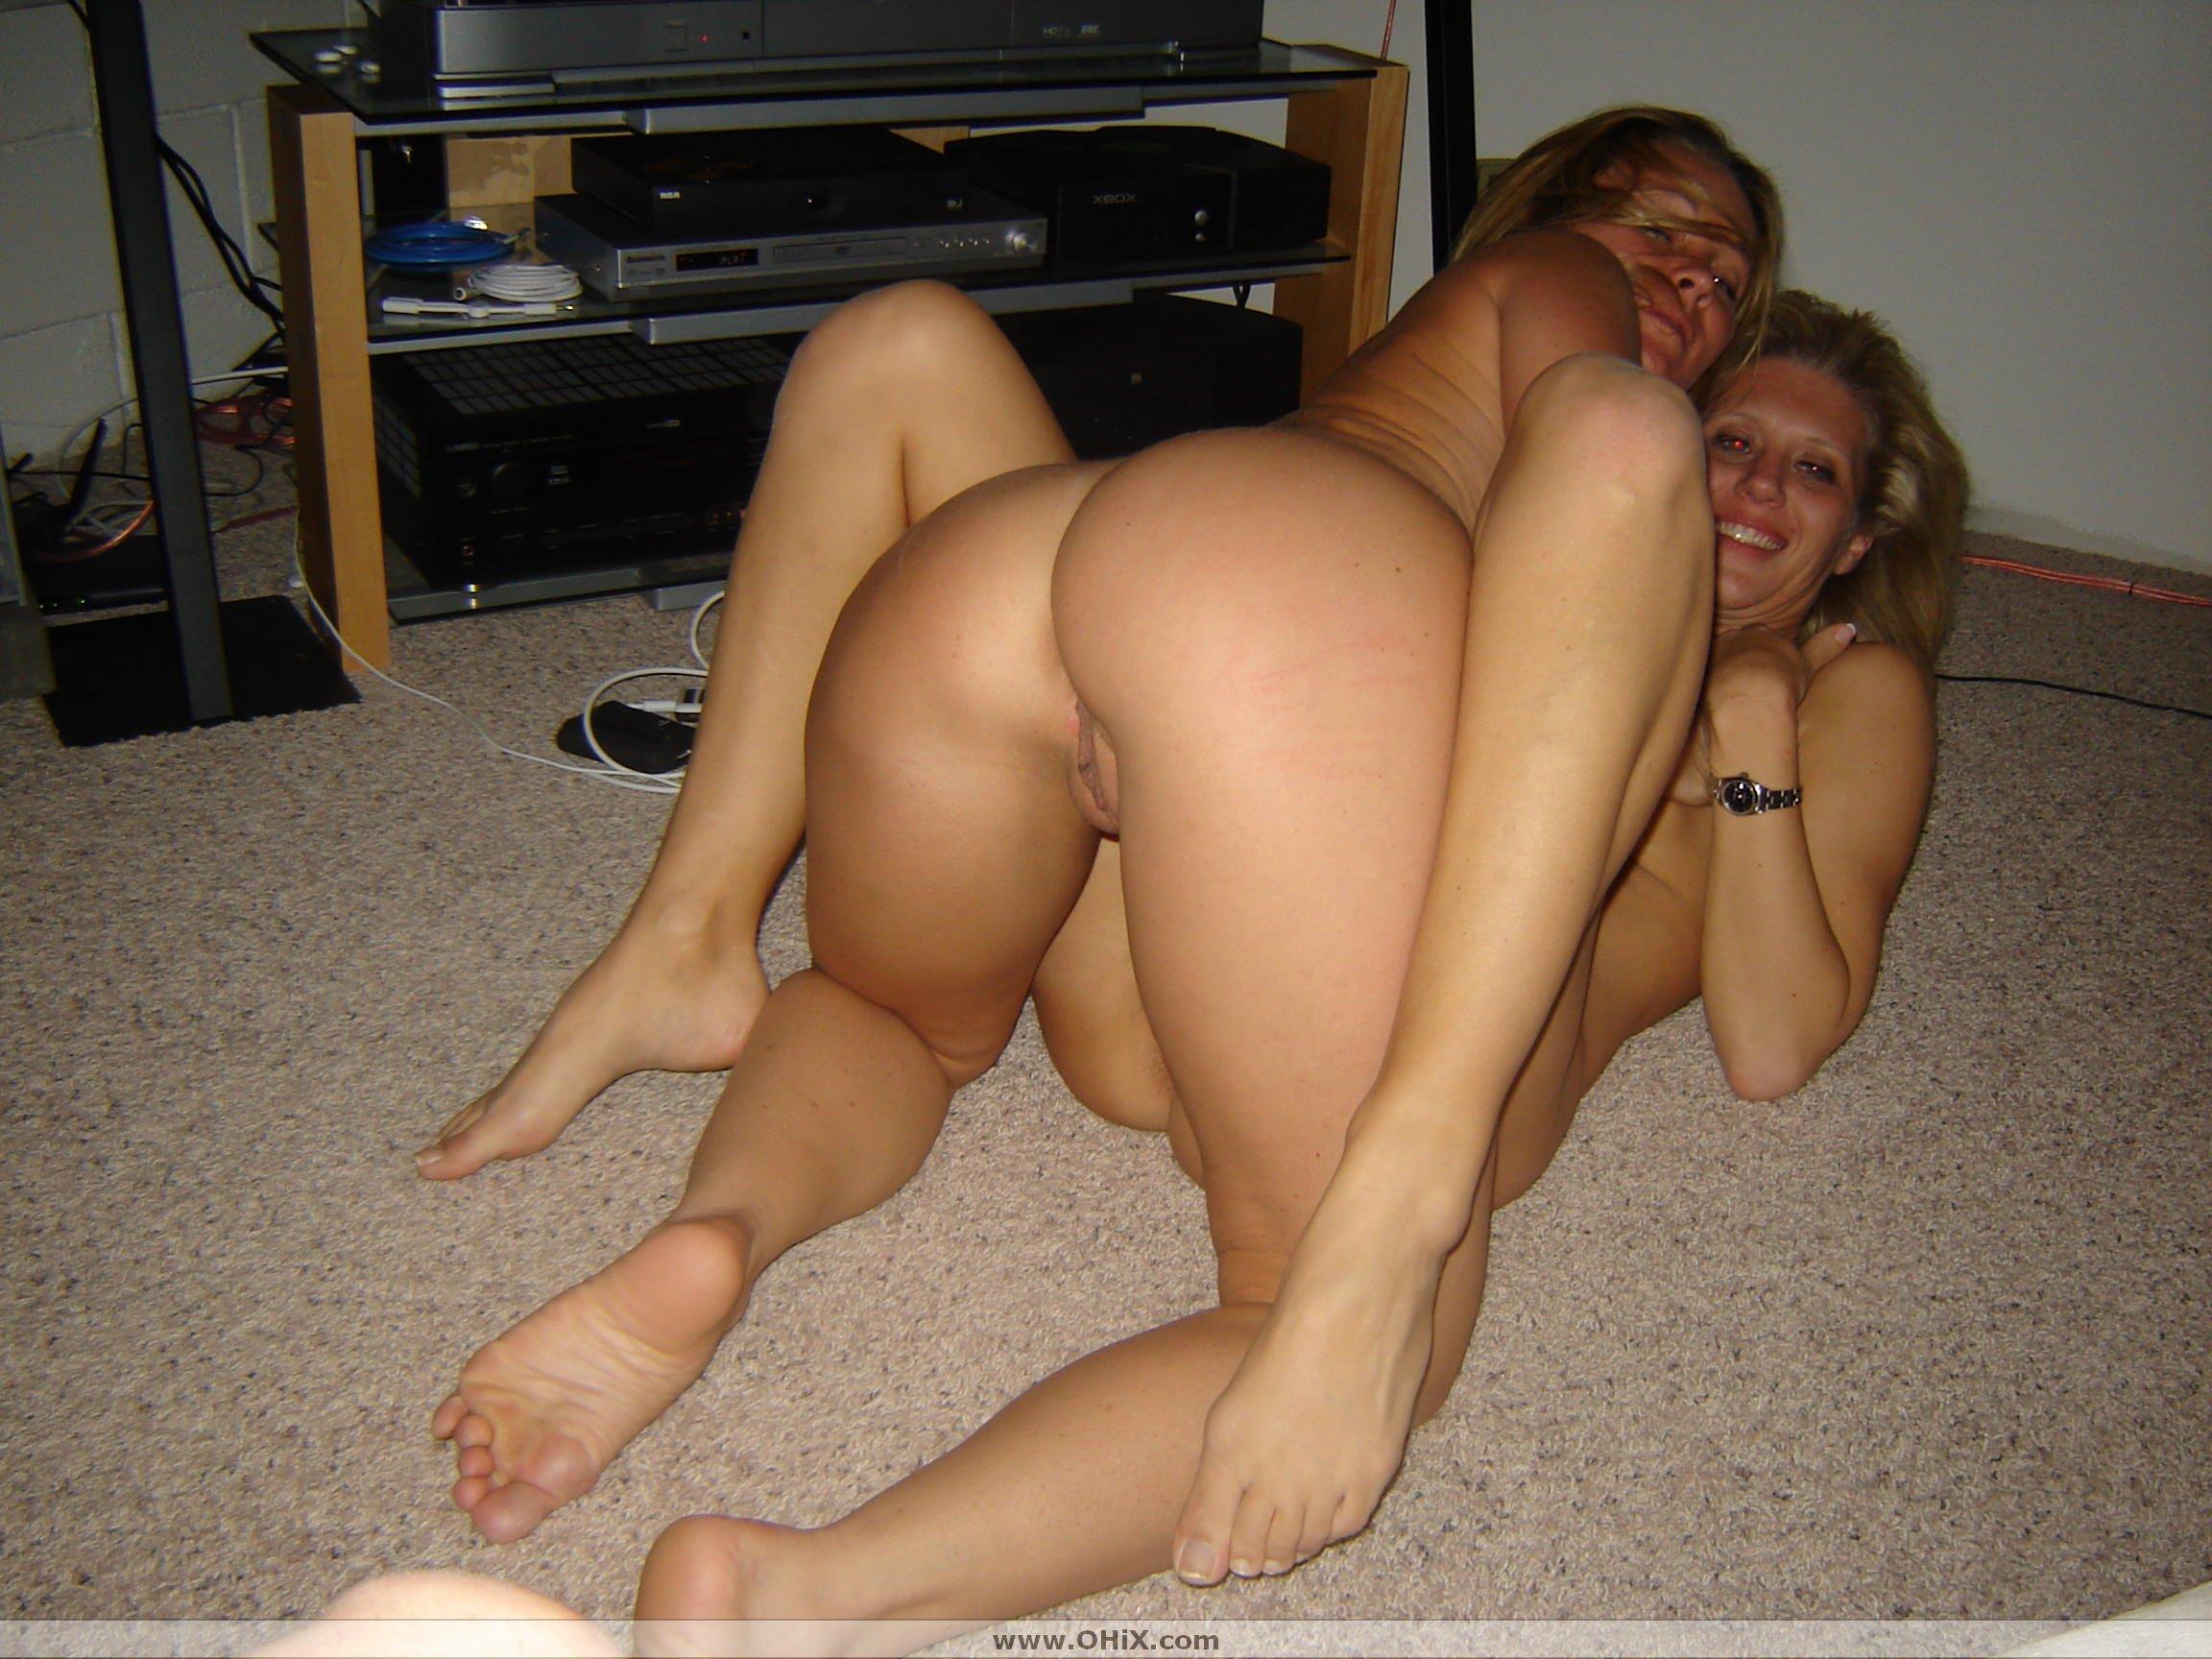 http://static.ohix.com/photos/Trio-2-blondes-chaudes/13.jpg